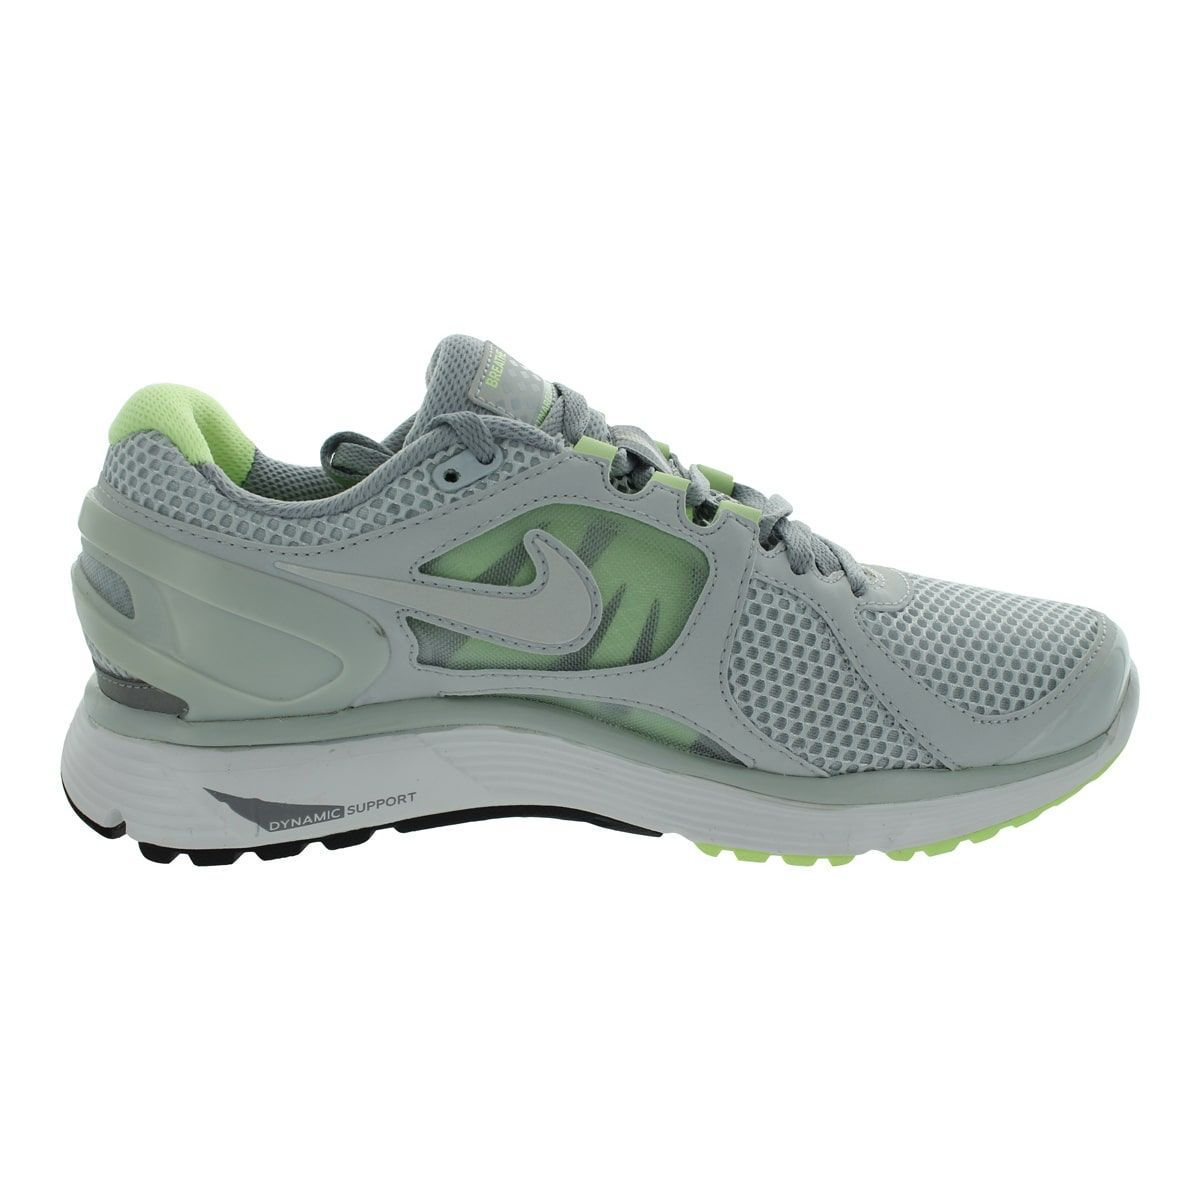 Nike Lunareclipse+ 2 Breathe Women's Running Shoes